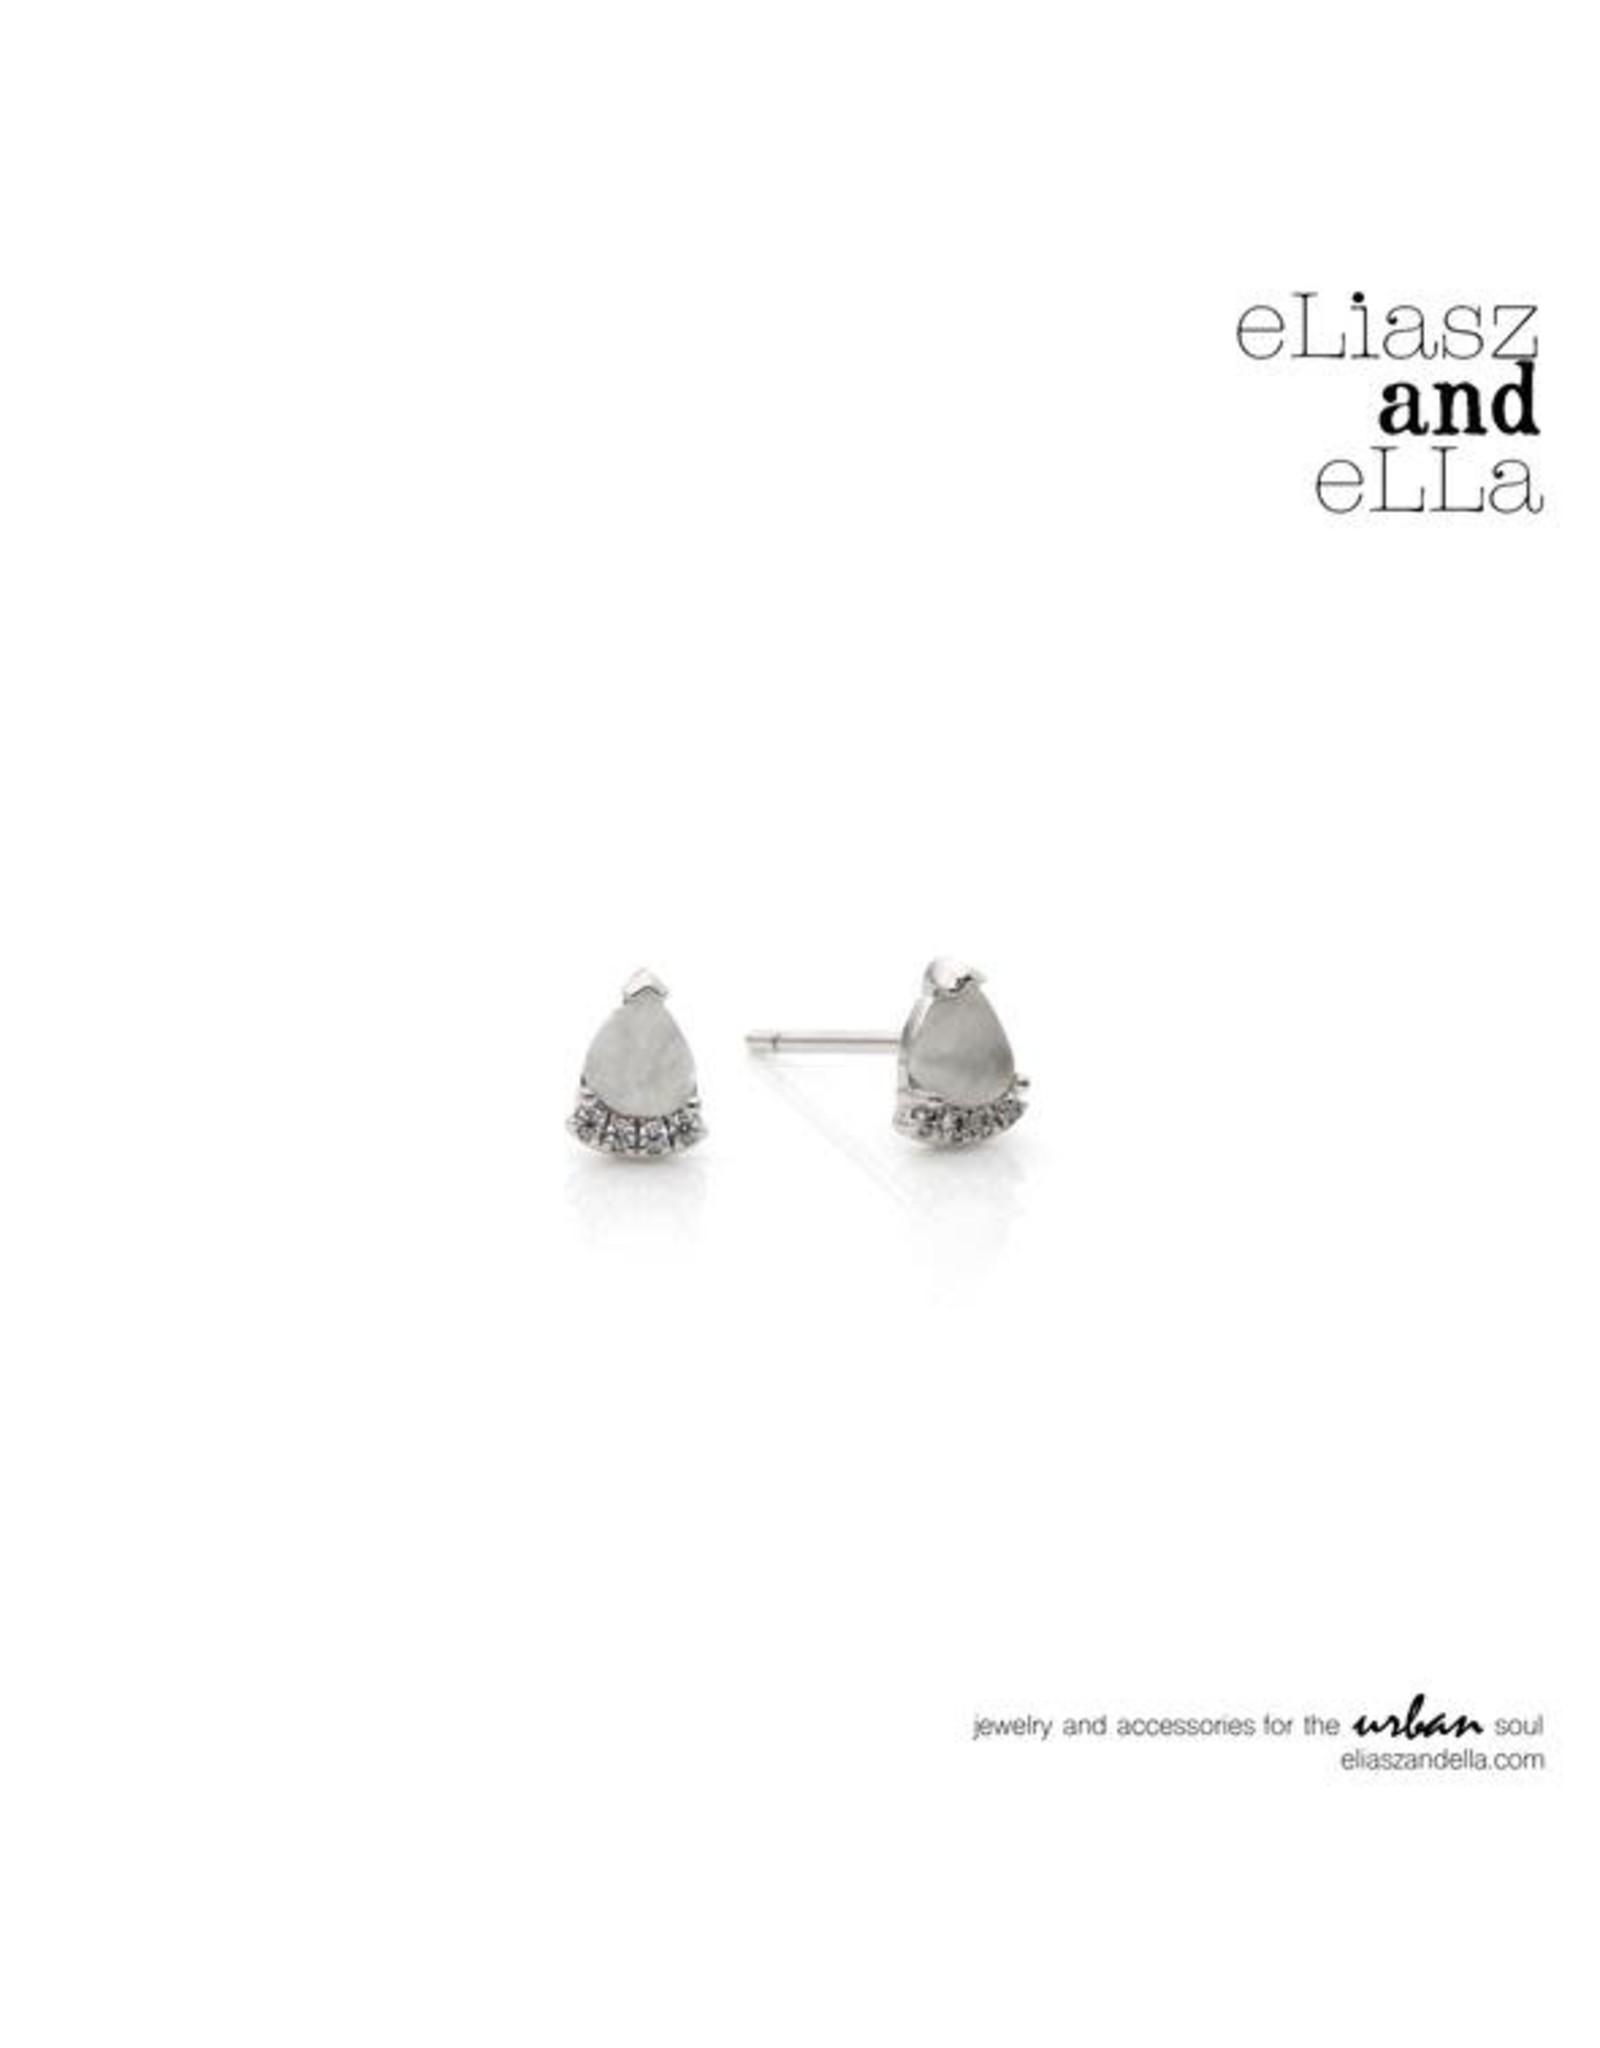 "eLiasz and eLLa Silver ""Dainty"" Studs Earrings"